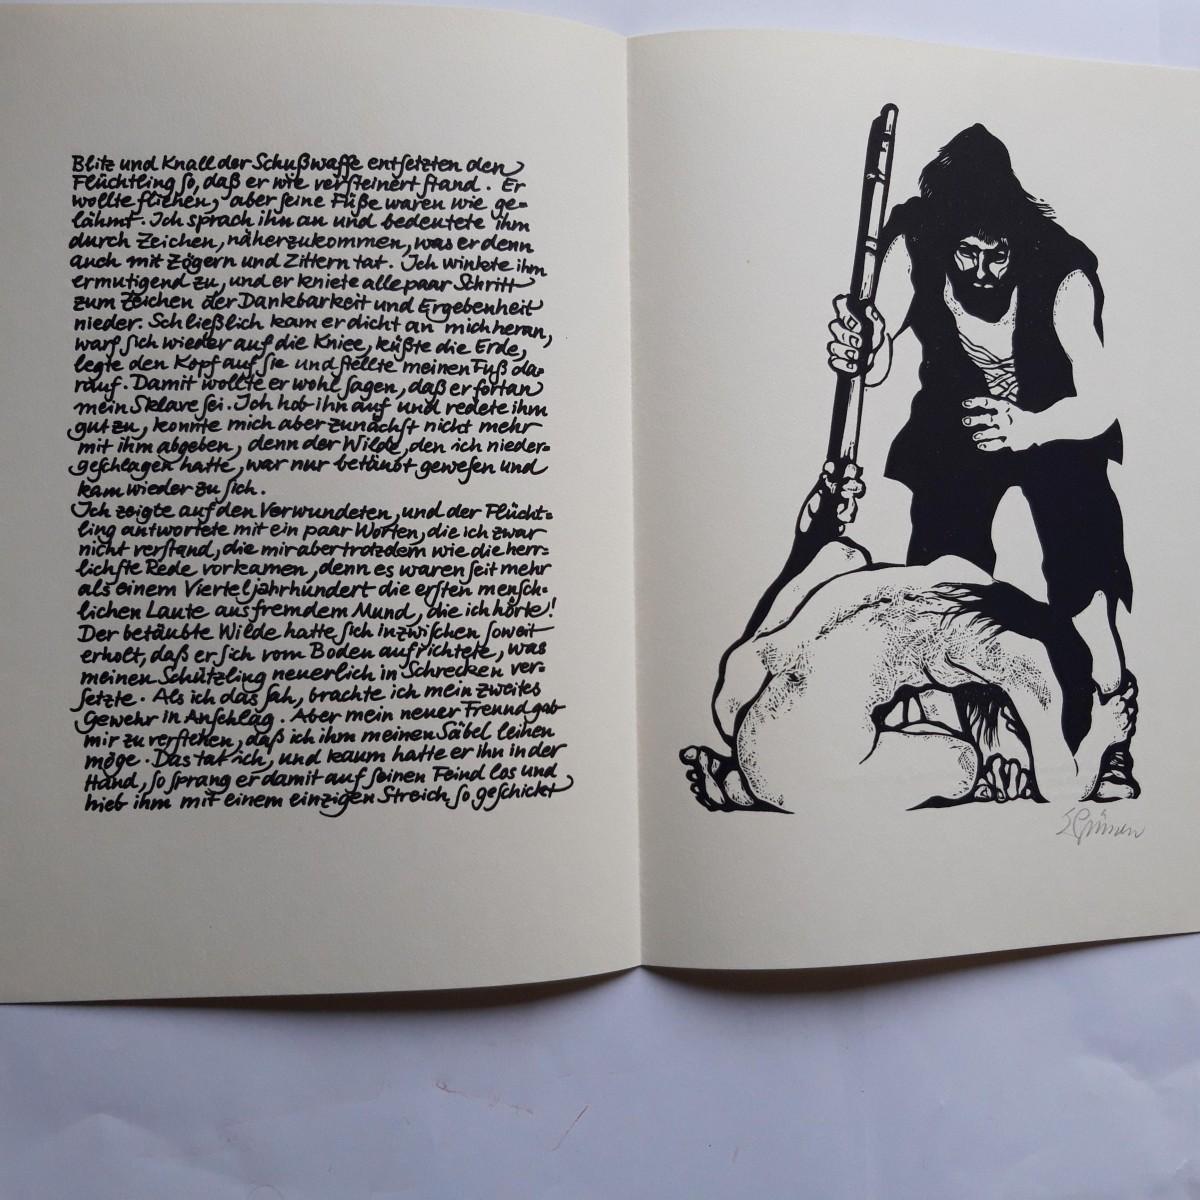 Eduard Prüssen - LINOLSCHNITT, 1-FARBIG SCHWARZ, 1977 kopen? Bied vanaf 55!